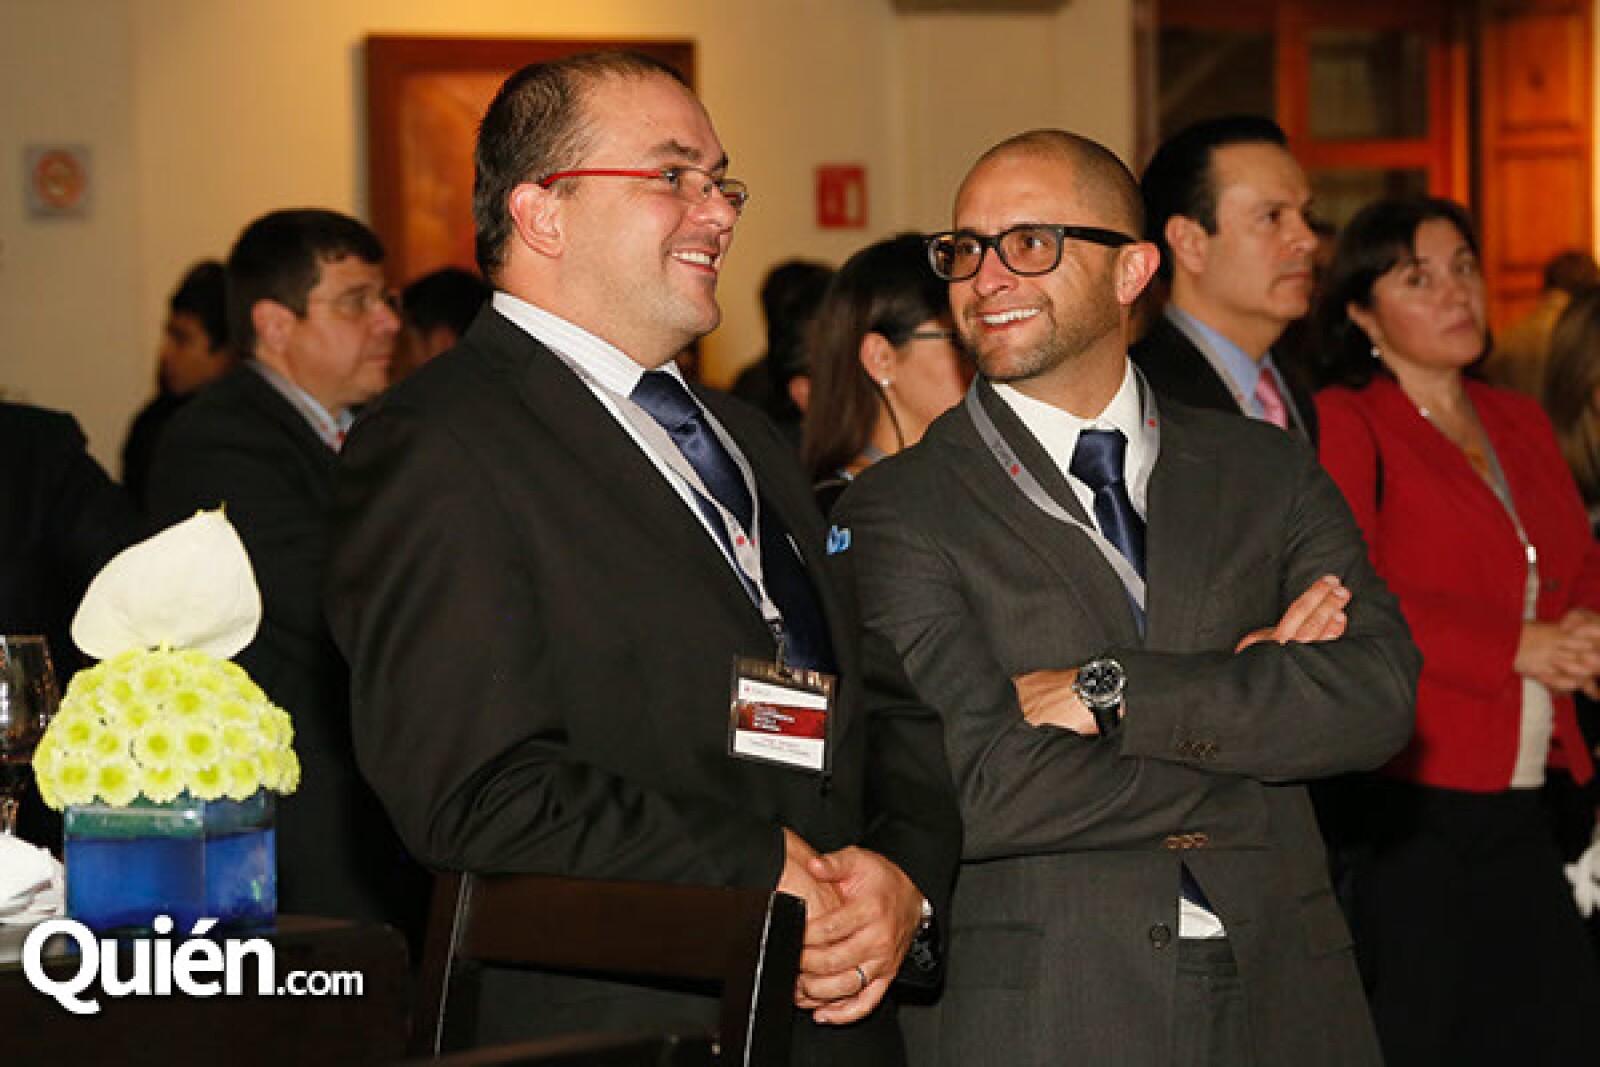 Jorge y Marcos Carrasco